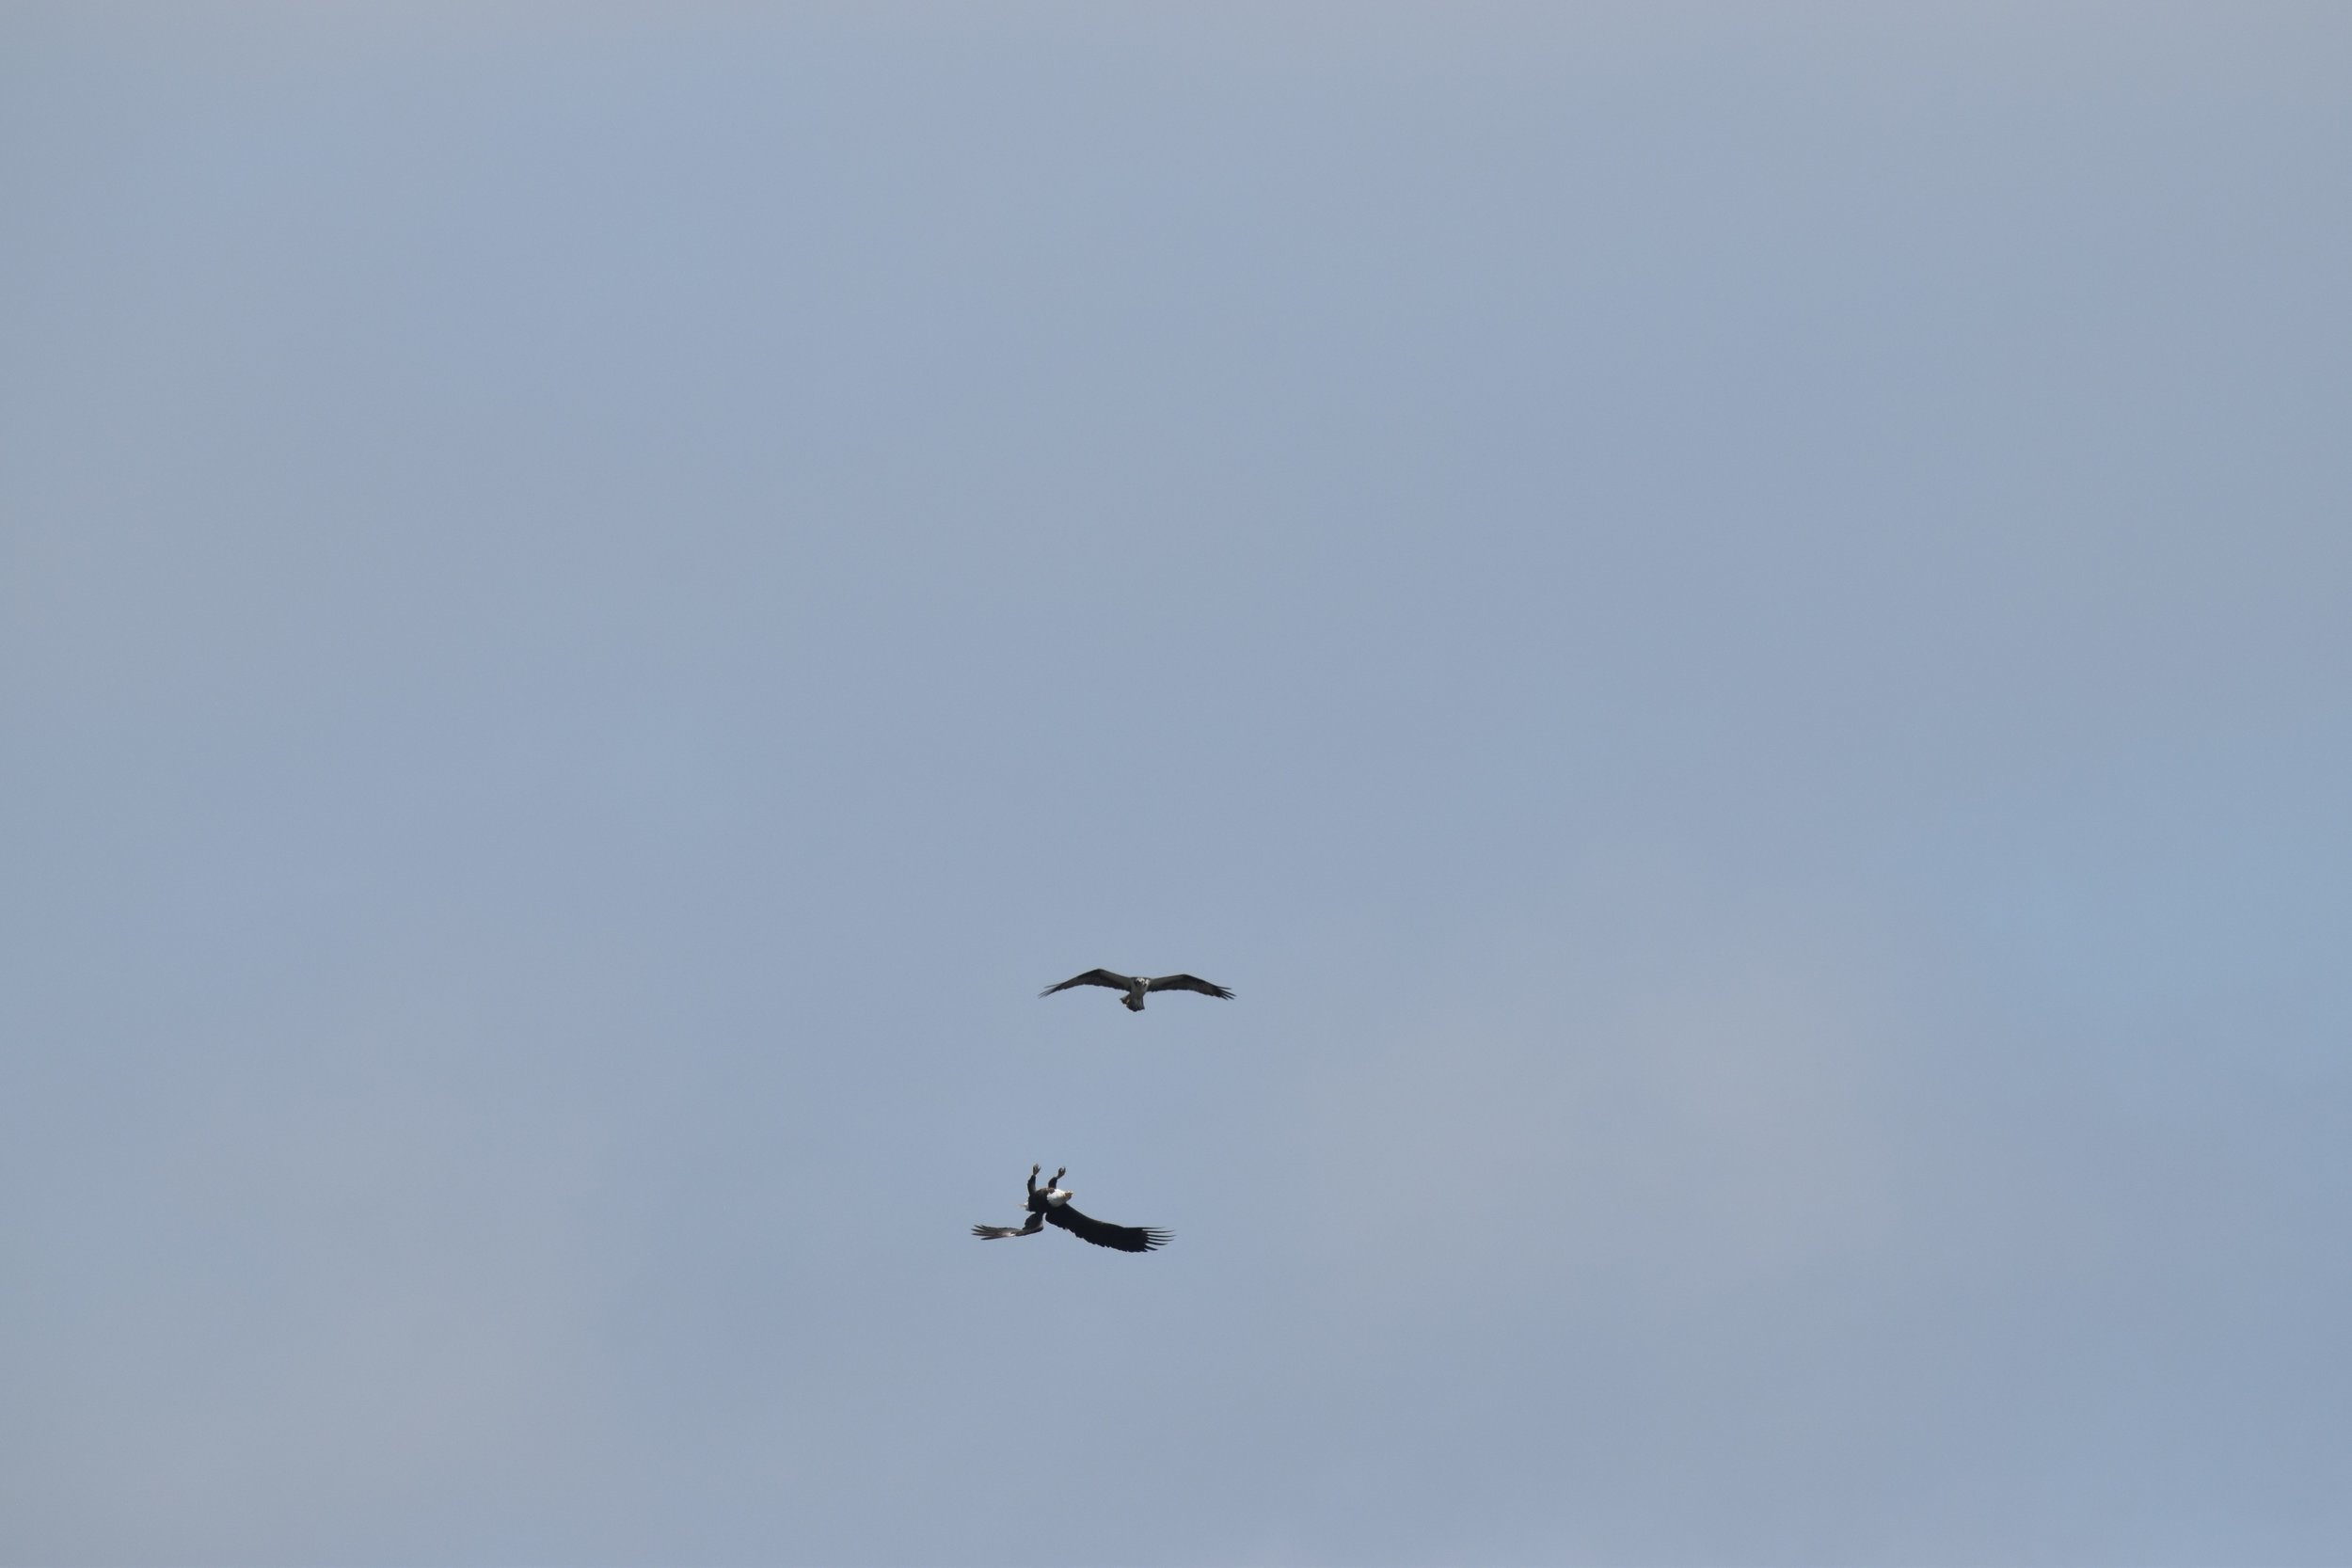 Osprey vs. Bald Eagle aerial territory skirmish over Tuttle Marsh Wildlife Area in Iosco County, Mich. Photo credit: Dion Carmona